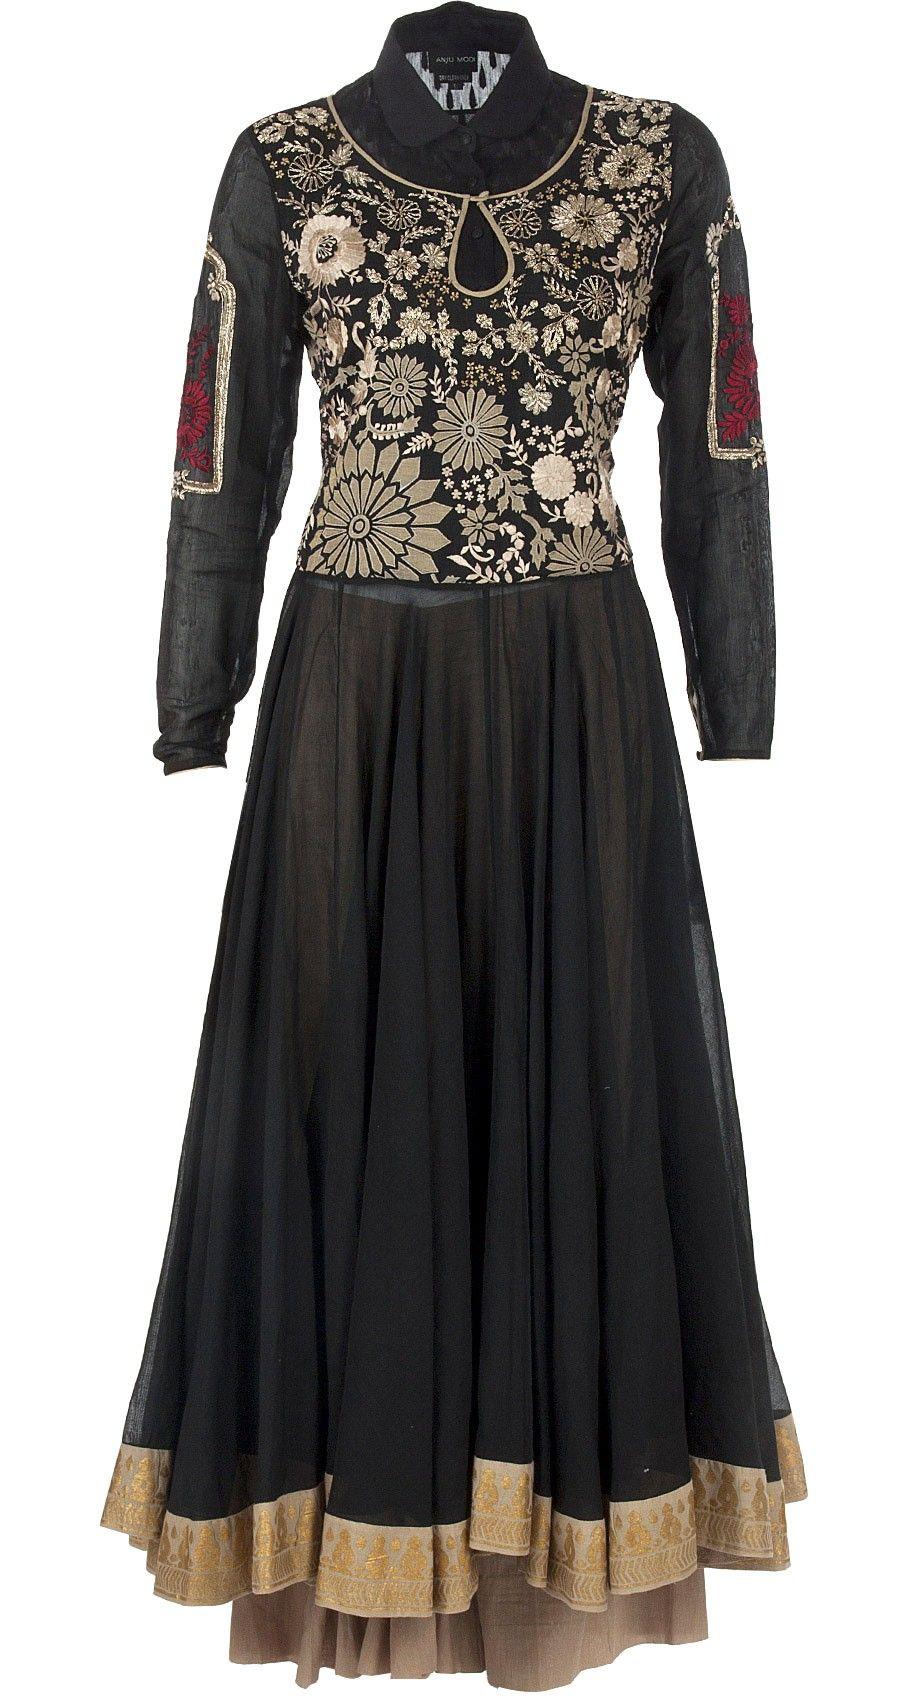 Anju modi fantasy clothes pinterest ethnic fantasy clothes